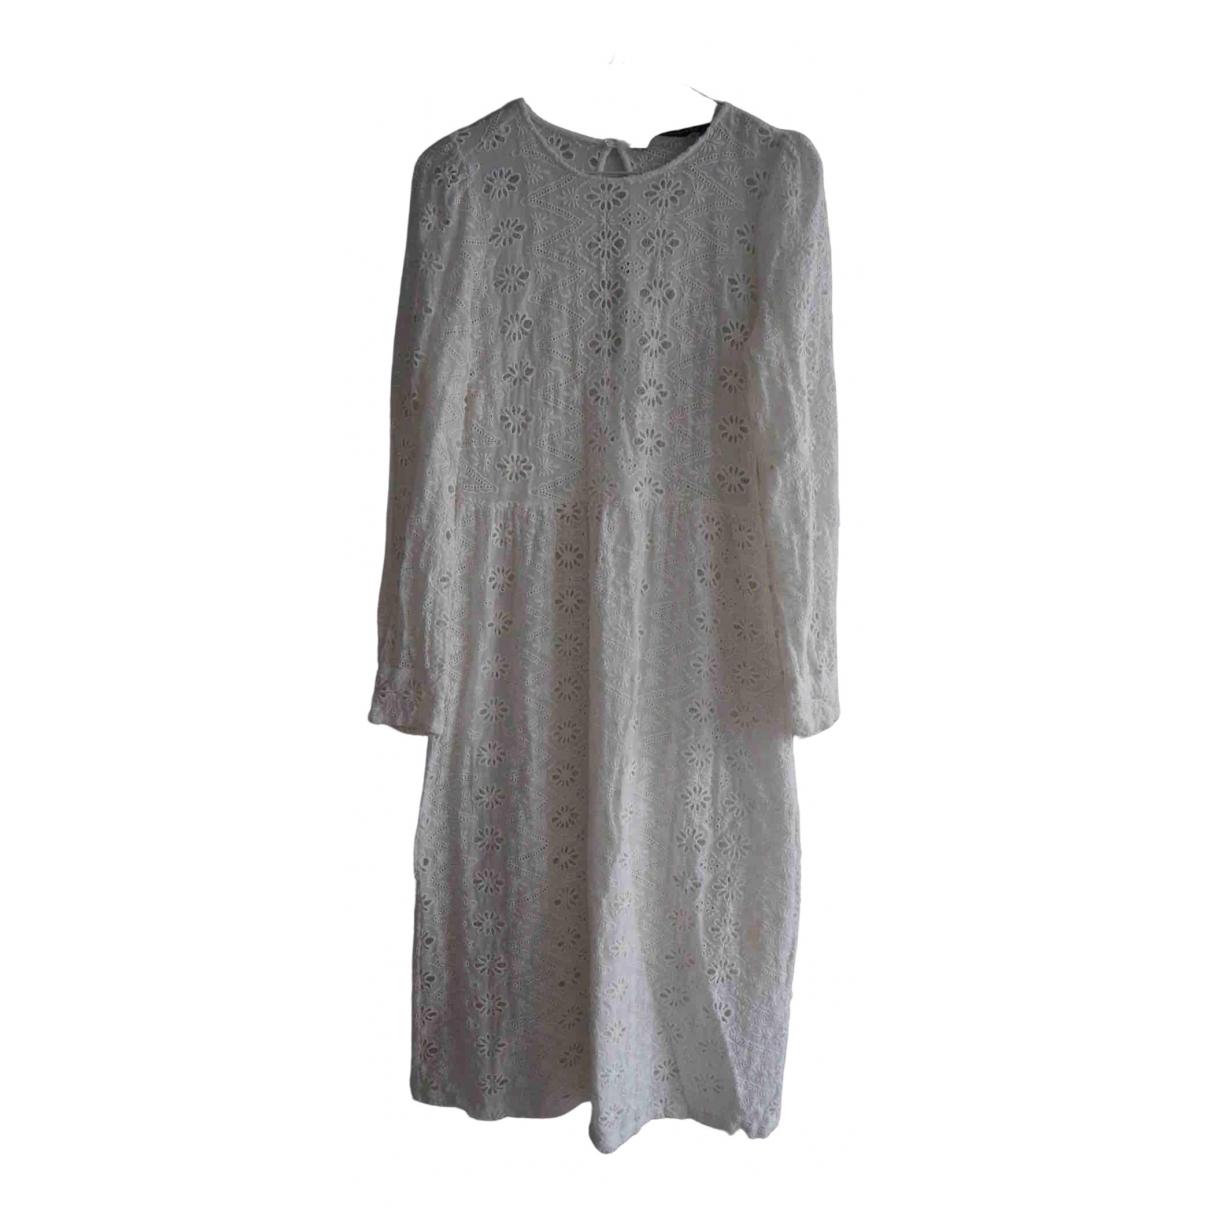 Zara \N White Lace dress for Women 12 UK